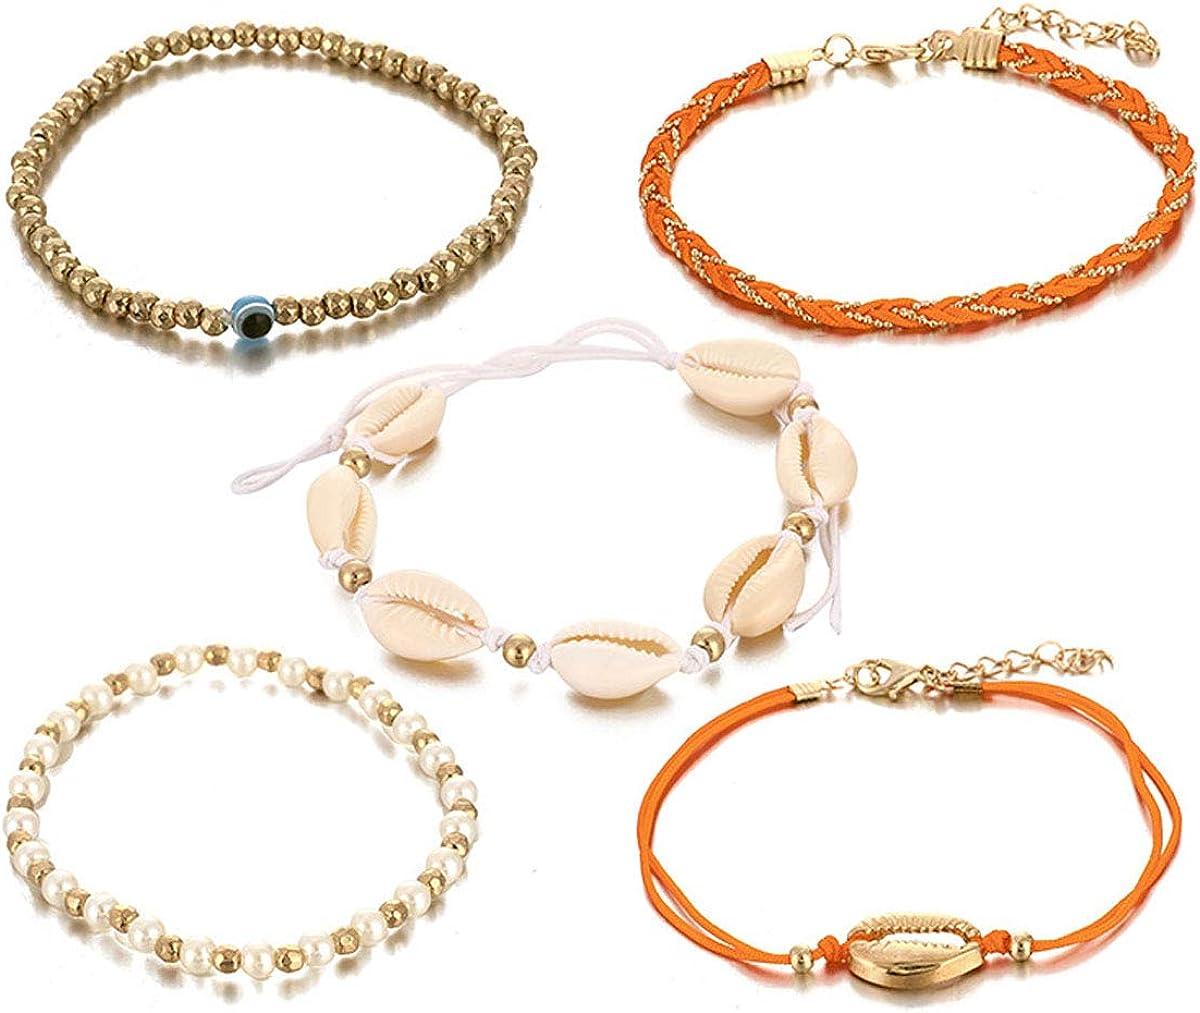 Lovogue Star Shell Anklets Bracelets Girls Women 5 ☆ popular for Puka Croche Cash special price